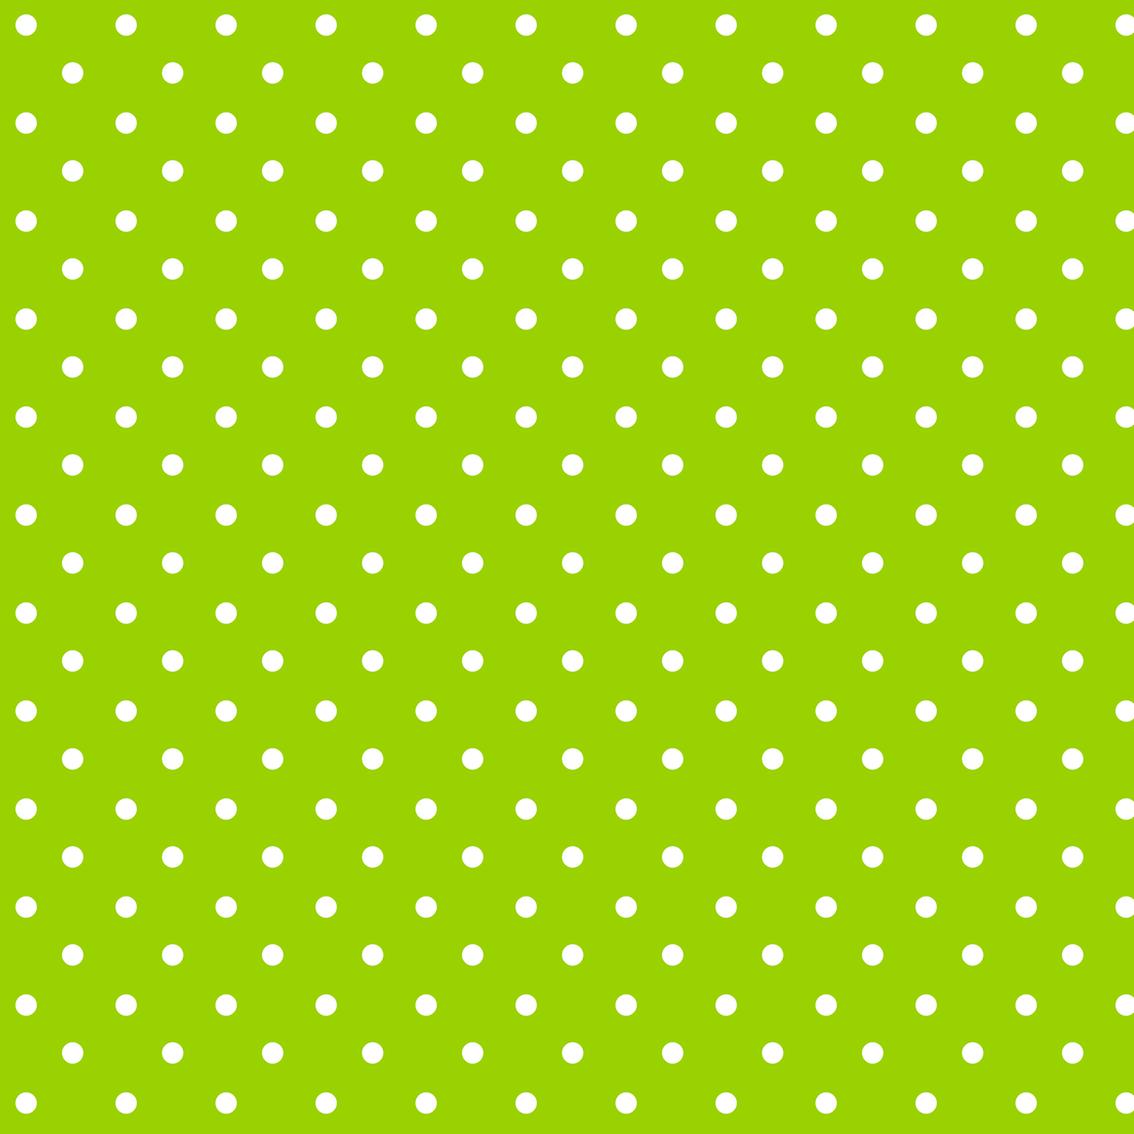 Free Polka Dot Background PNG - 153095